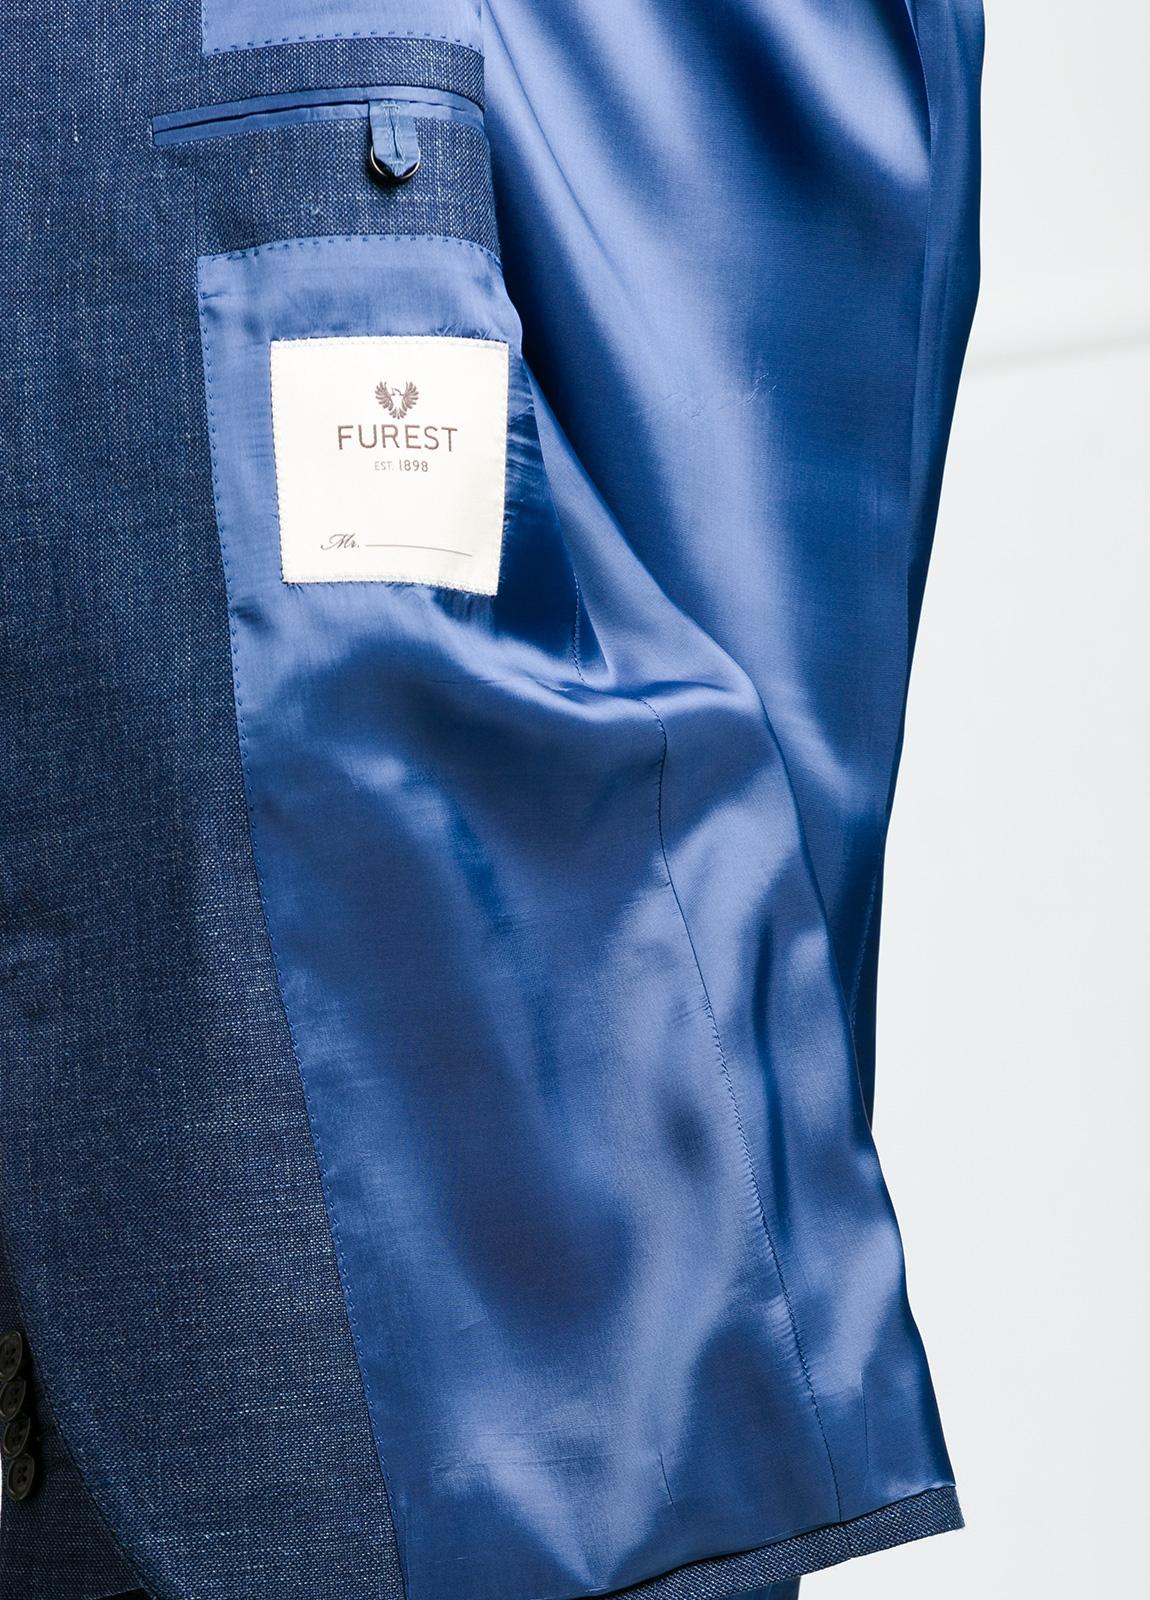 Americana Slim Fit color azul marino. 55% Lino 45% Lana. - Ítem1